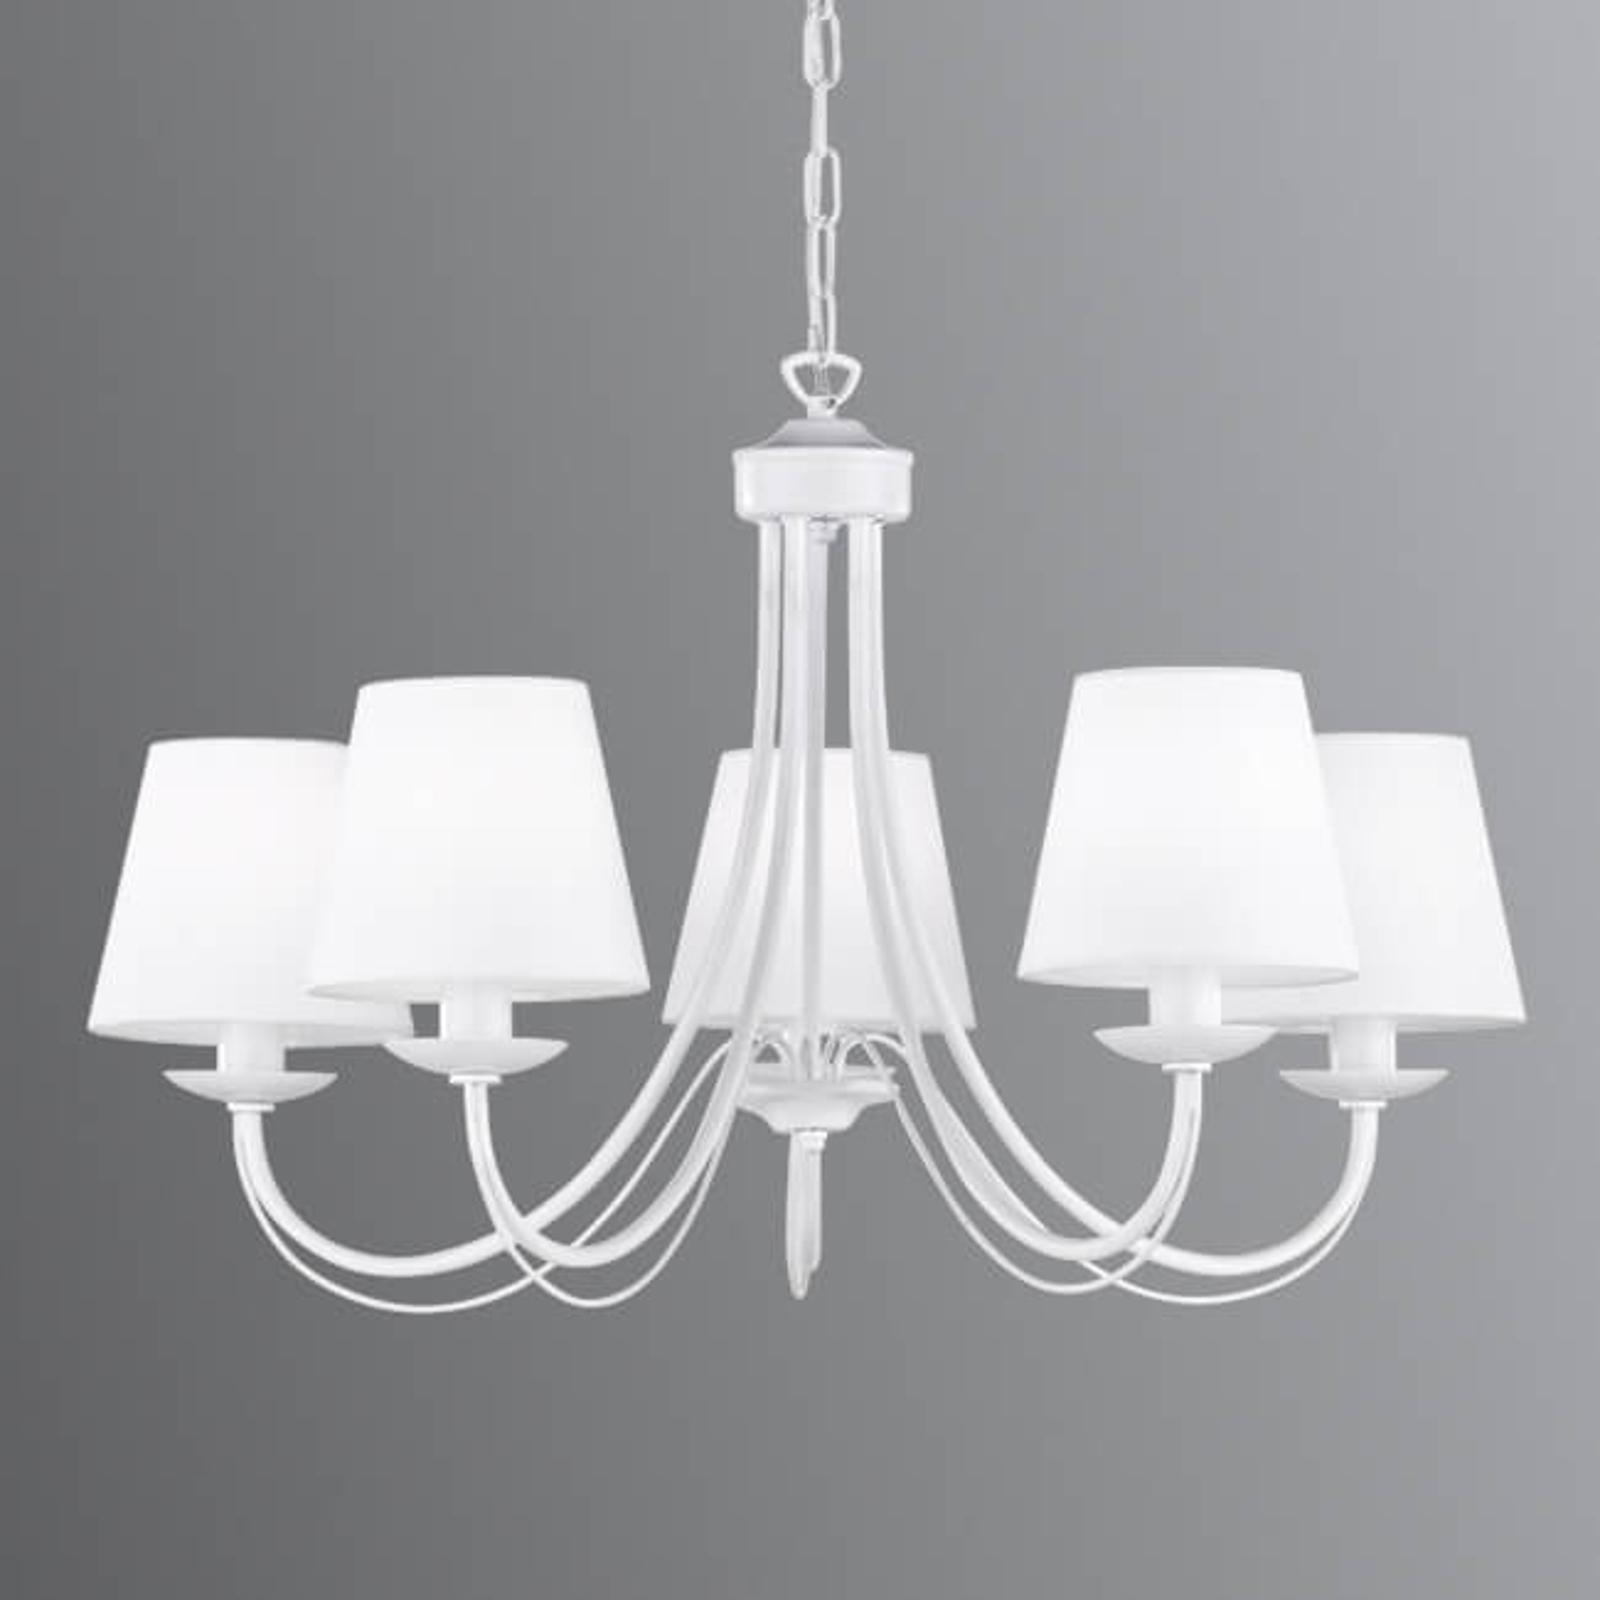 Lustr Cortez, bílý, 5 žárovky